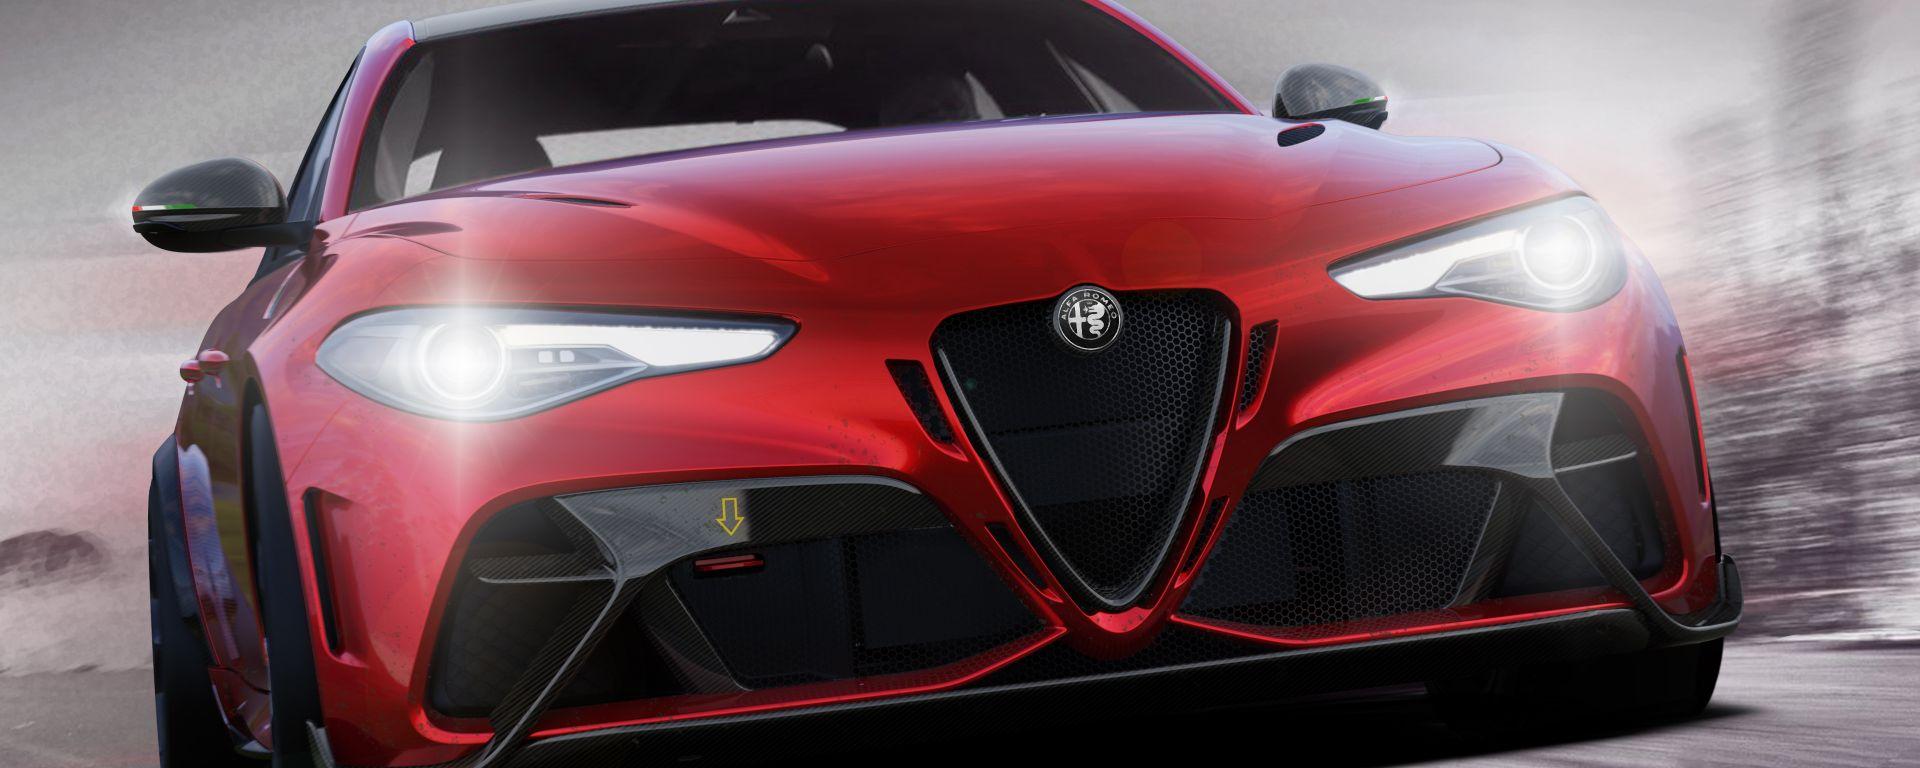 Nuova Alfa Romeo Giulia GTAm